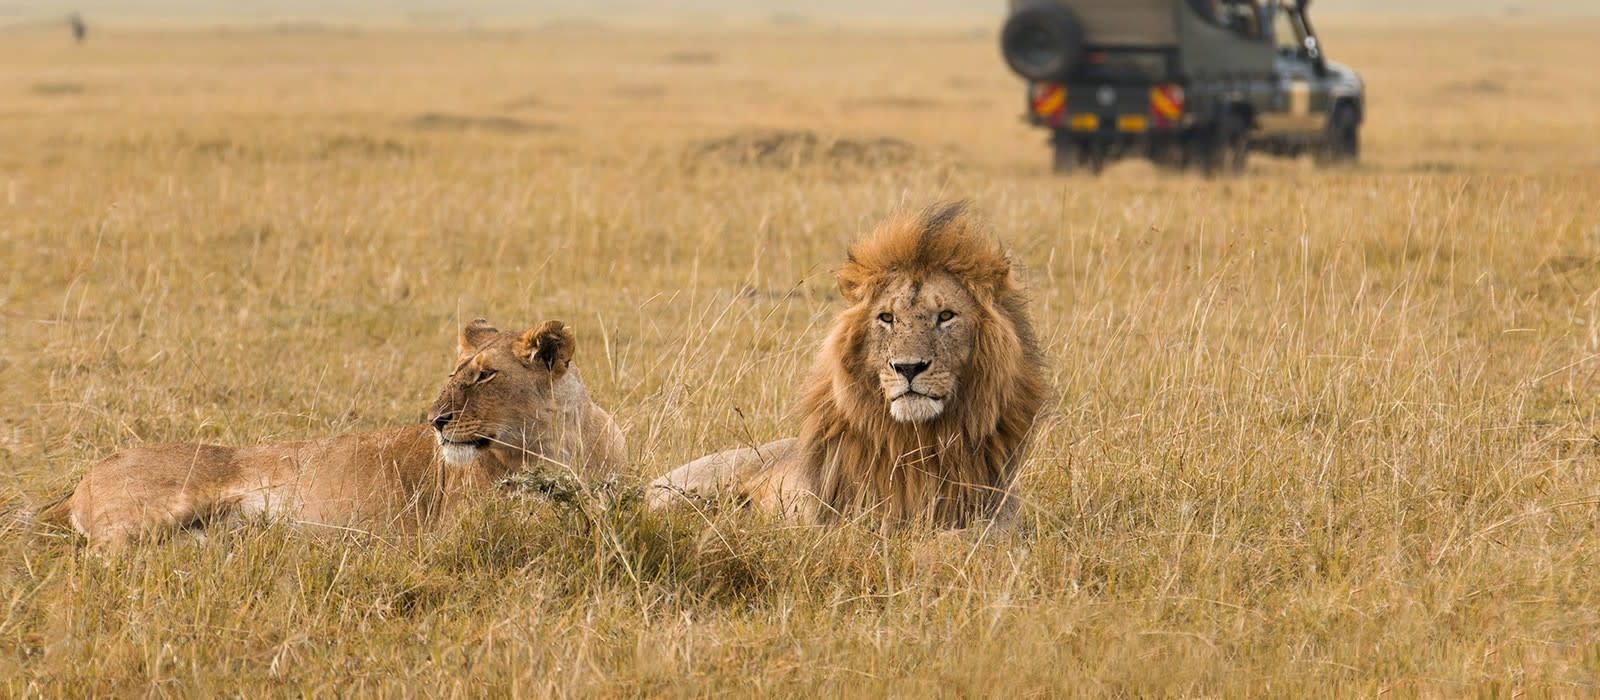 Kenia & Sansibar Reise: Safaris & Strände Urlaub 1